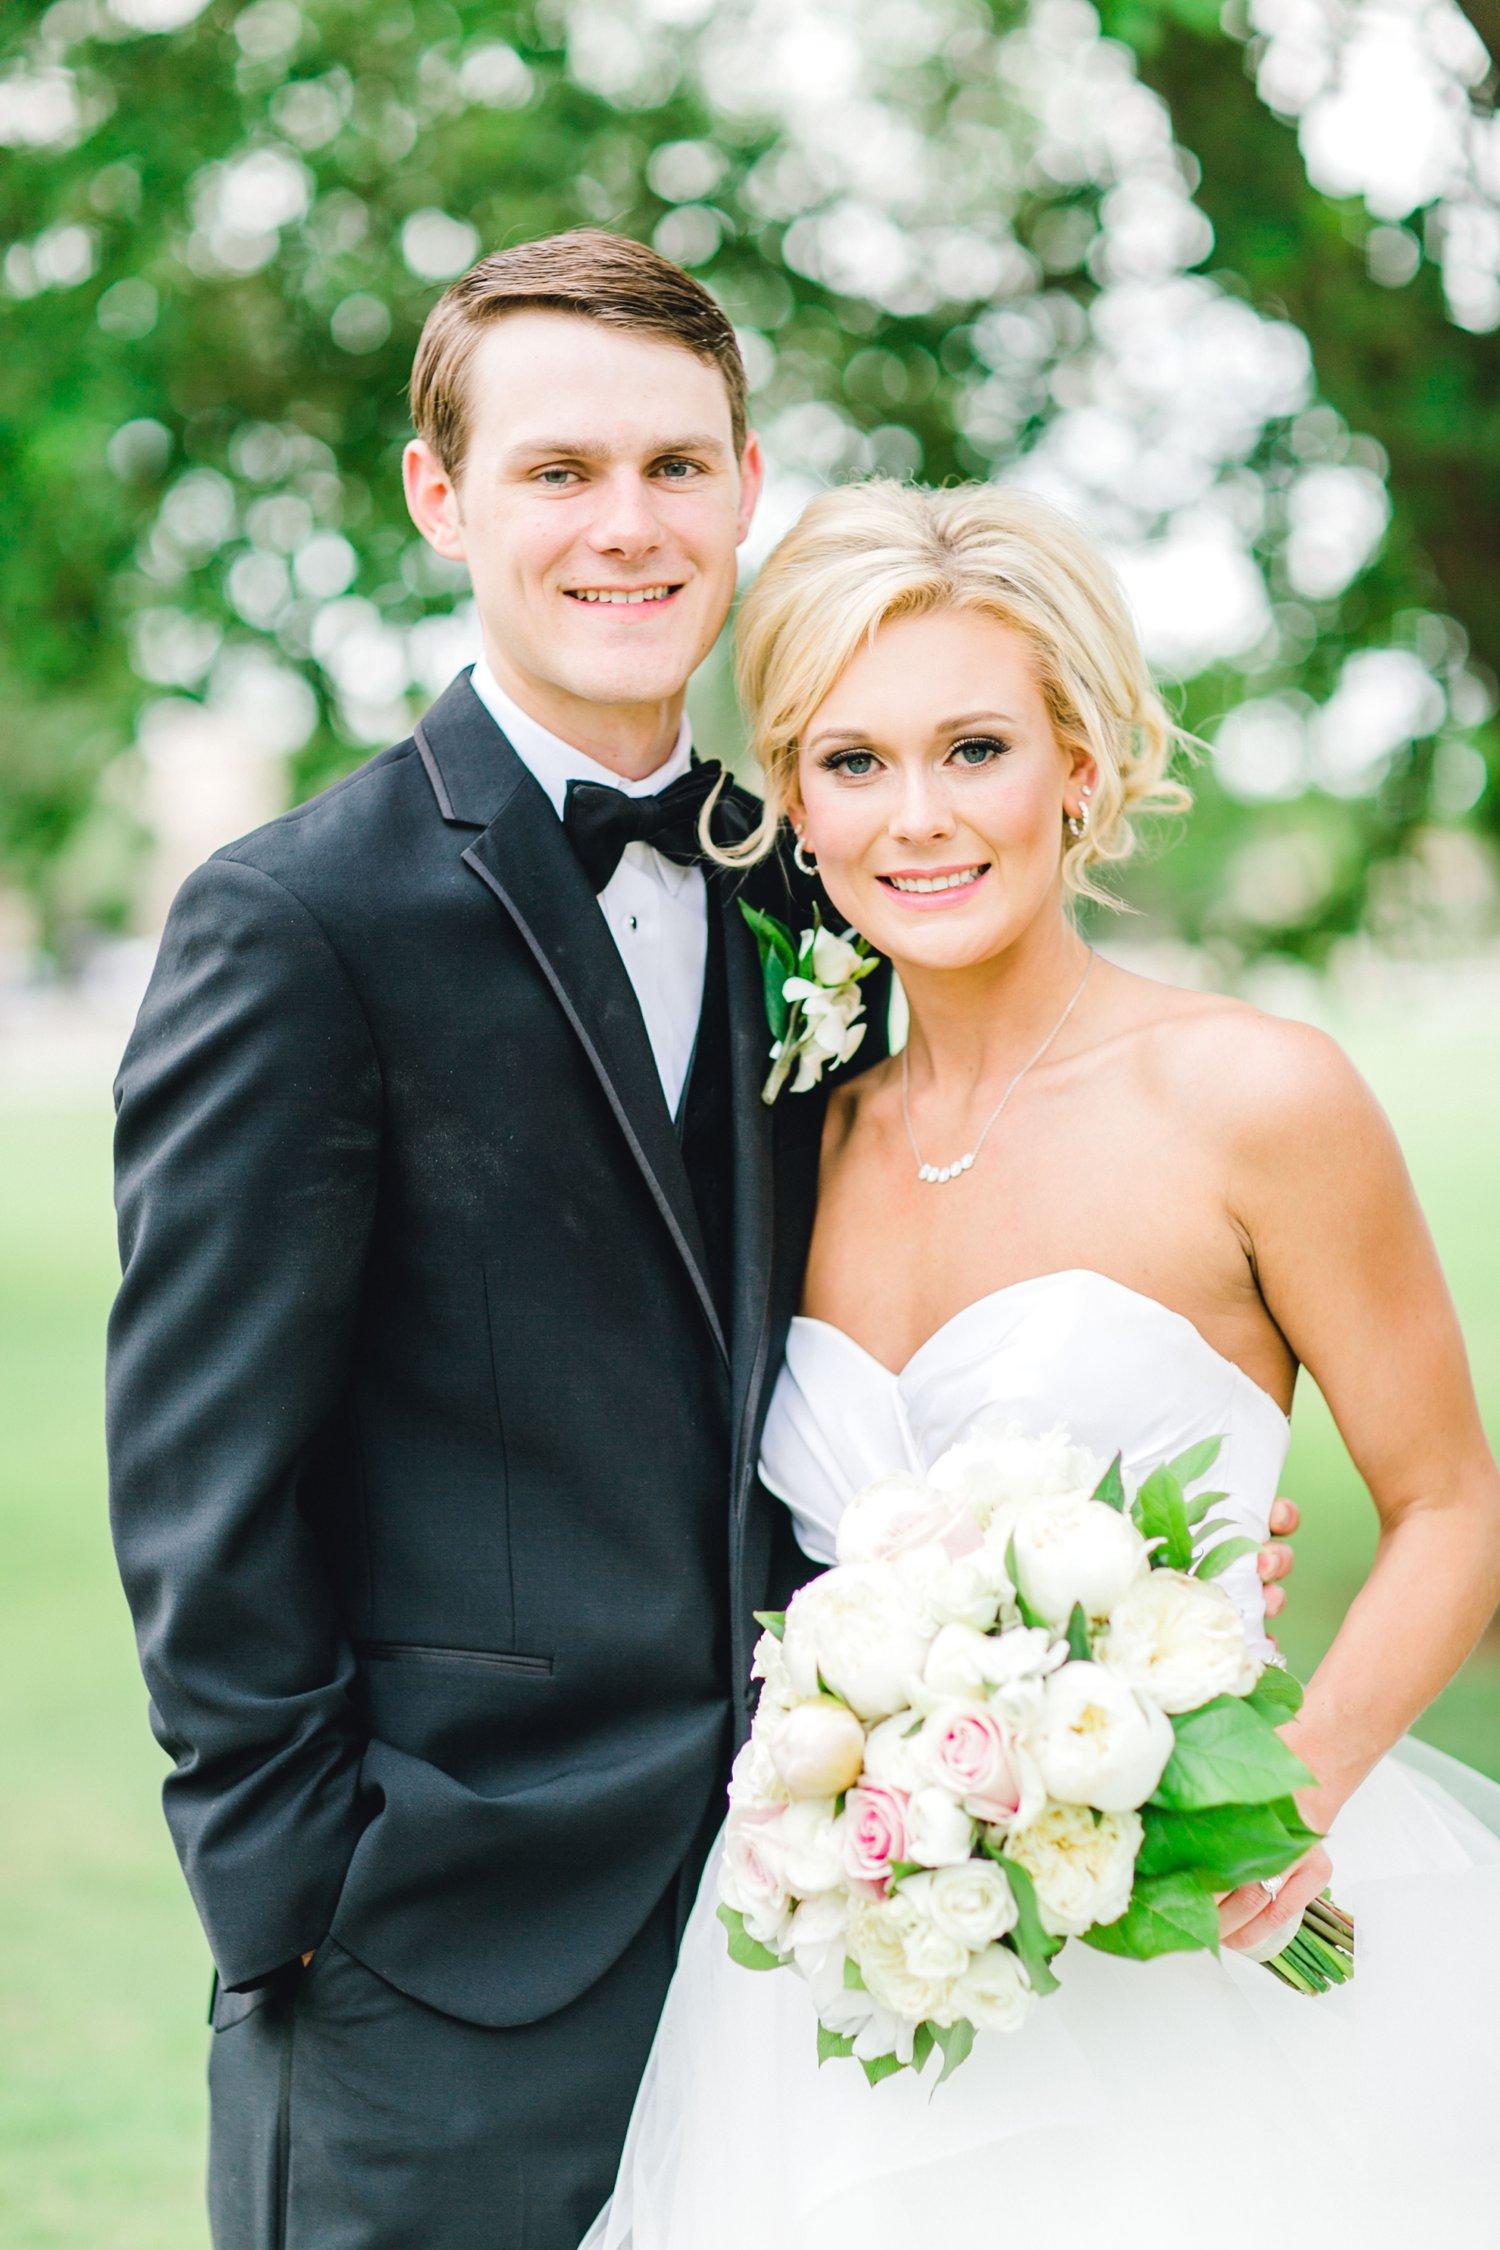 Taylor-and-Brock-Williams-Texas-Tech-University-Merket-Alumni-Center-Lubbock-Photographer-ALLEEJ0046.jpg